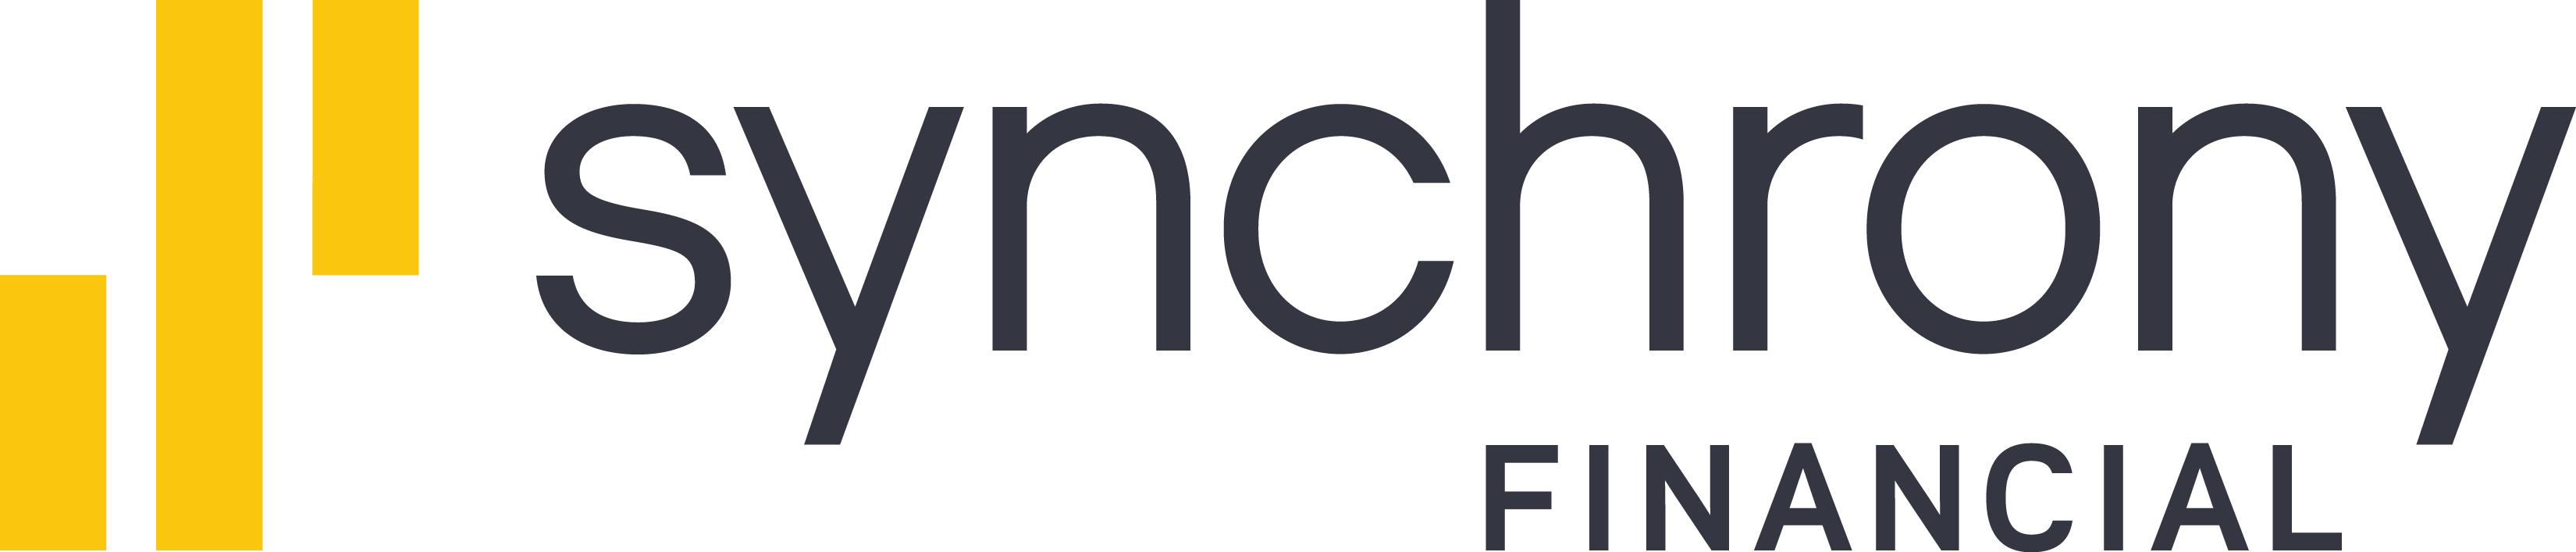 synchrony-financial-logo-goldcharcoal-transparent-cmyk.png